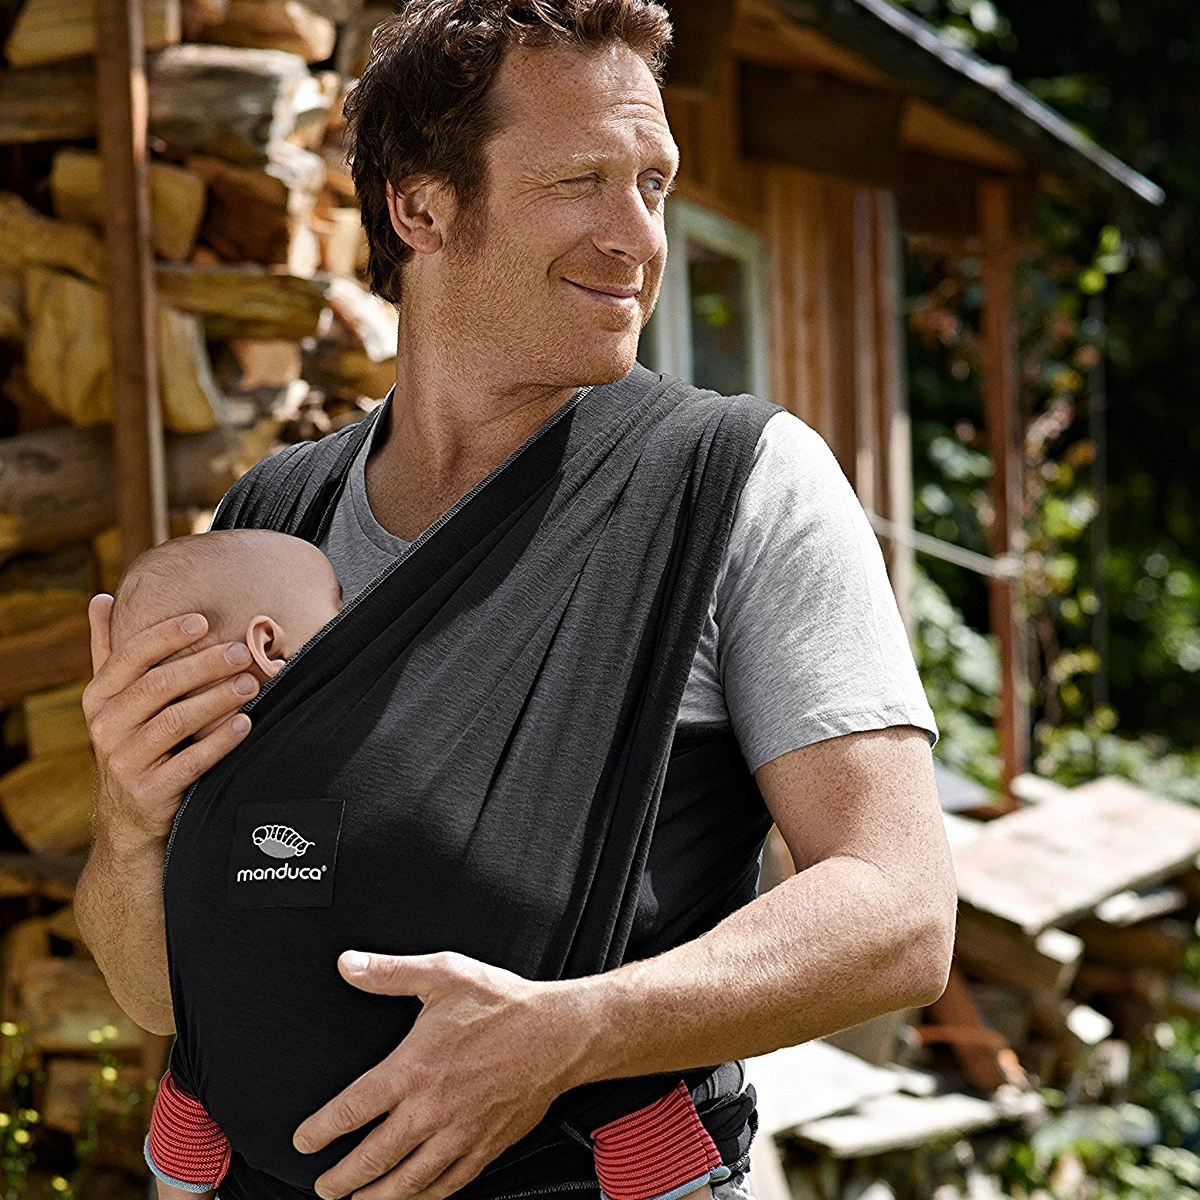 manduca echarpe de portage sling noir porte b b. Black Bedroom Furniture Sets. Home Design Ideas